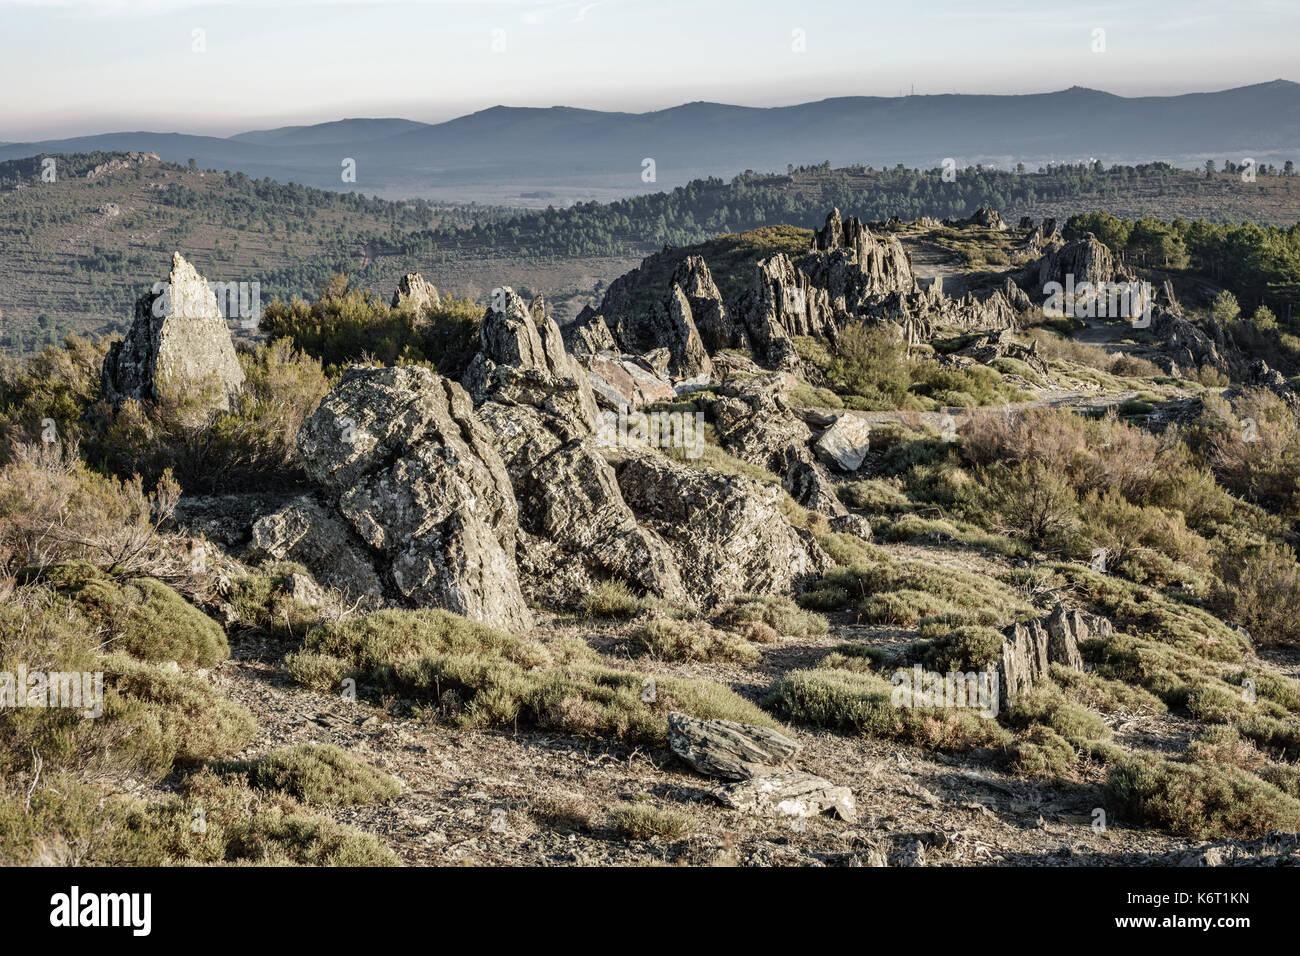 Nice track between rocks - Stock Image